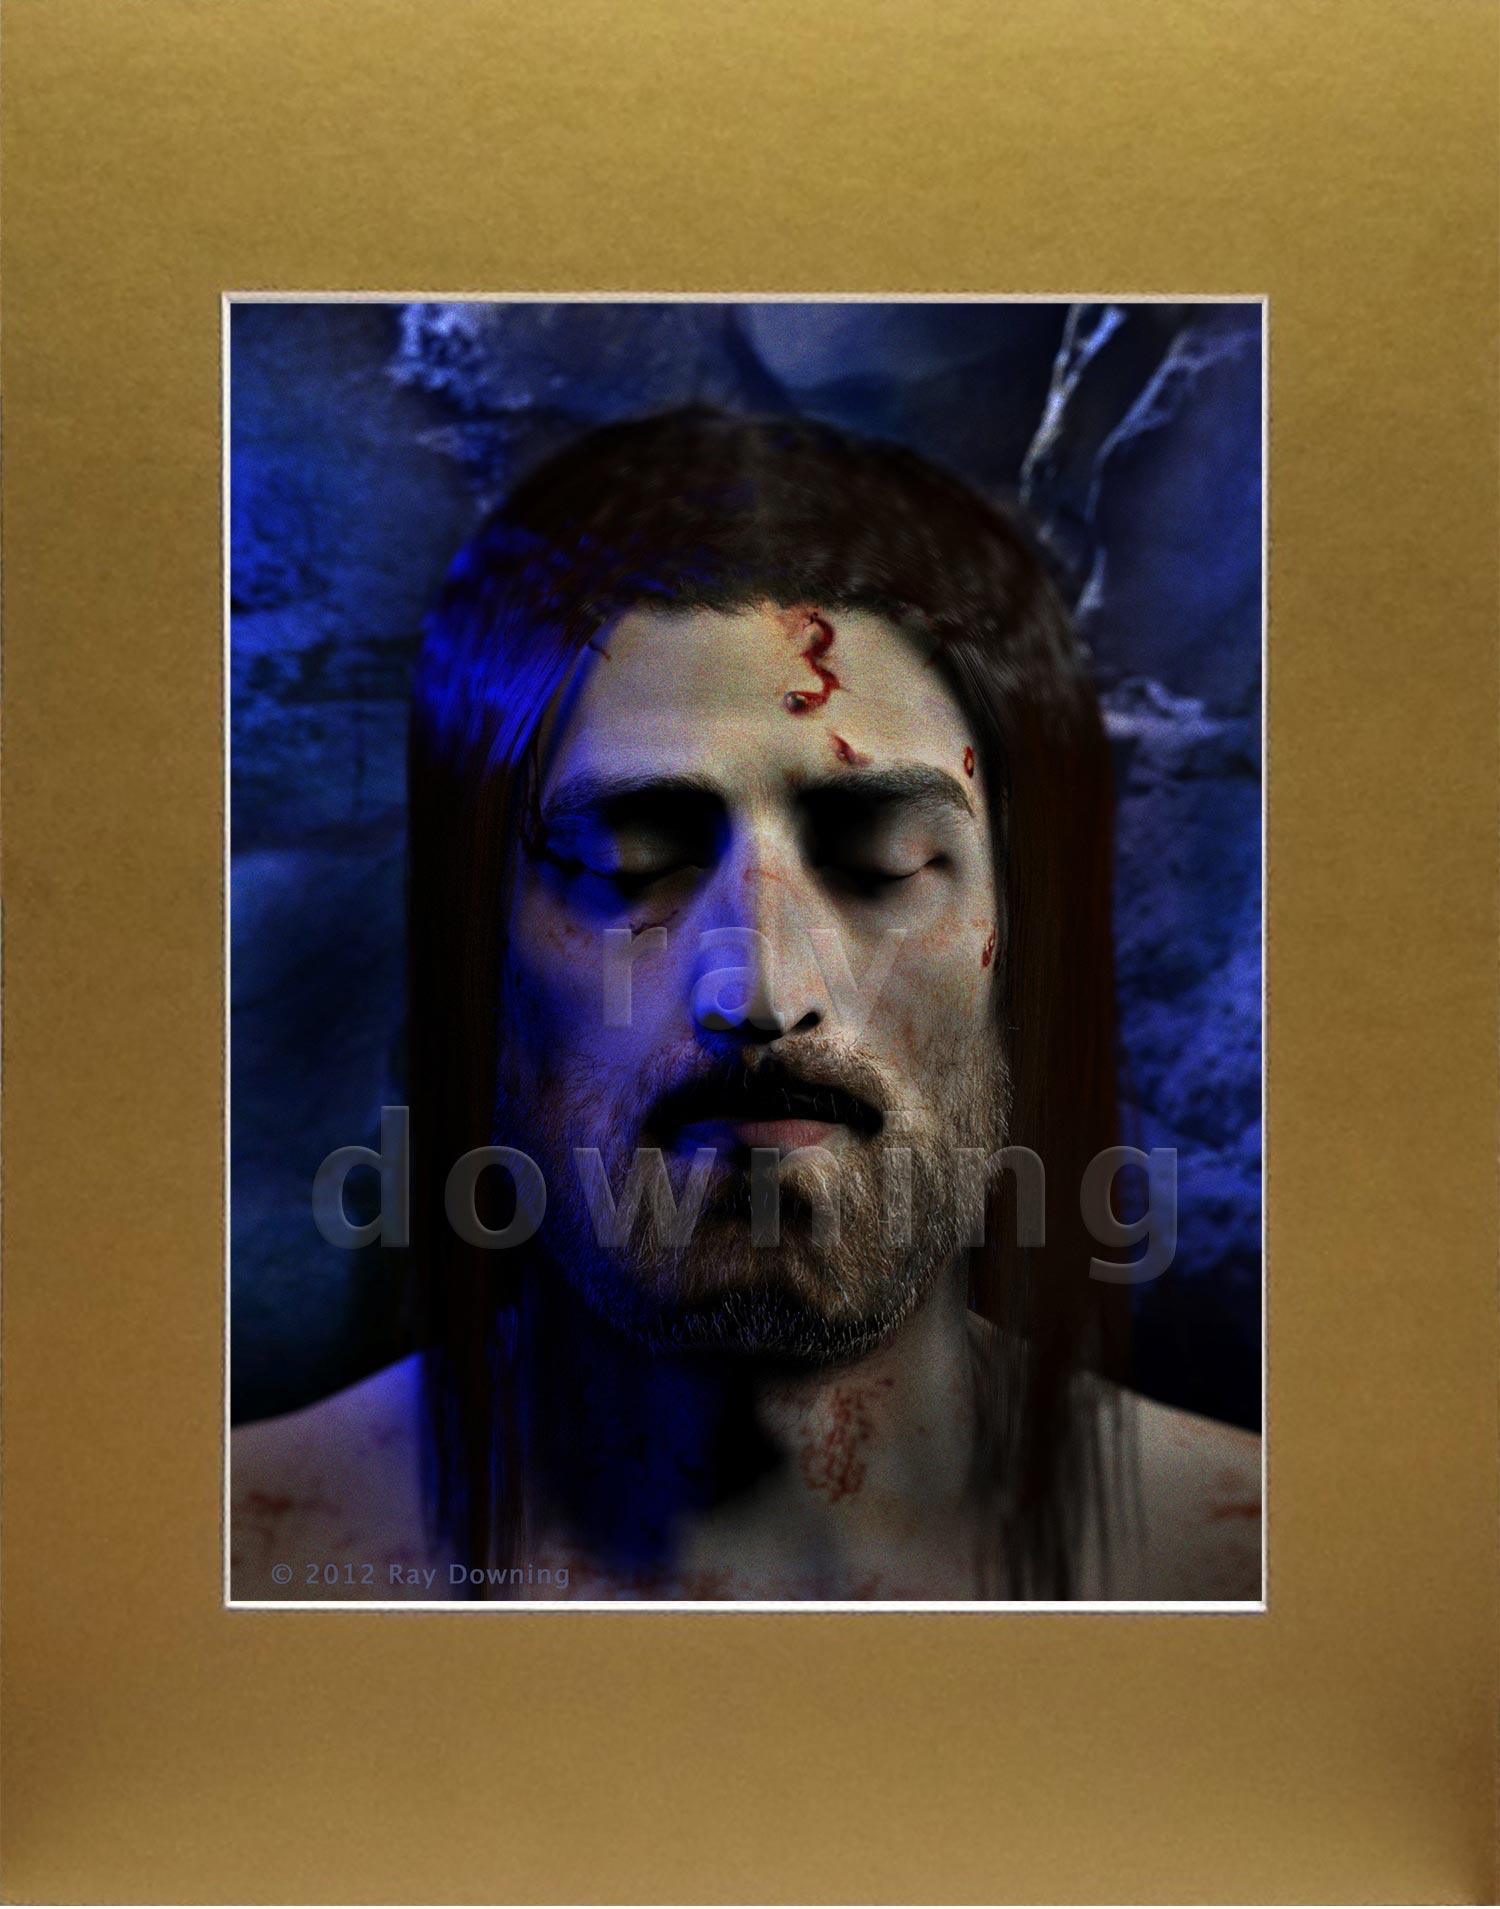 jesus-pictures-shroud-of-turin-death.jpg